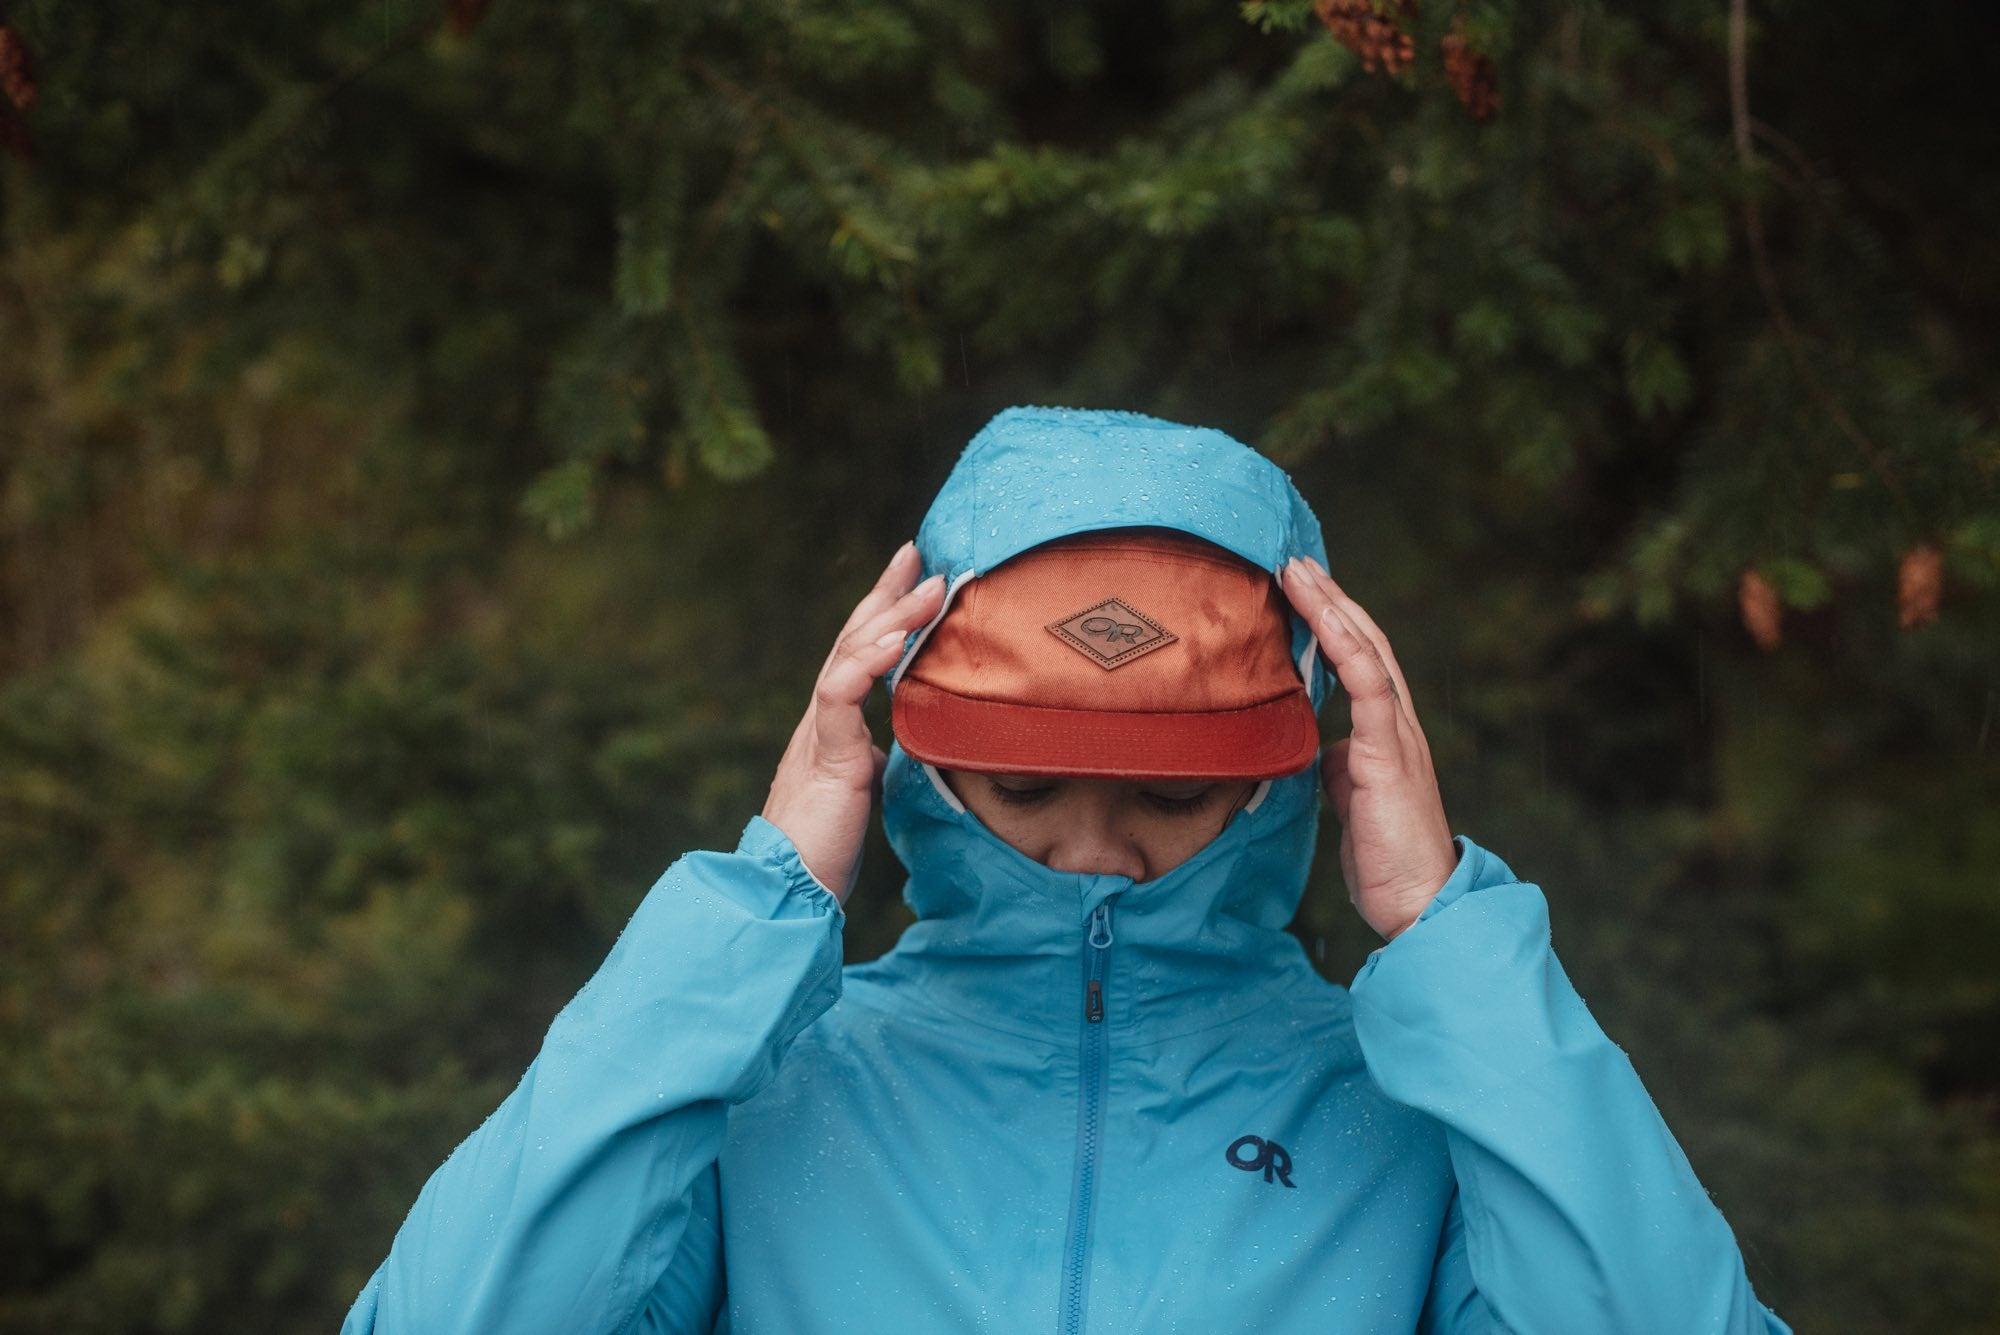 10 Tips For Optimizing Your Rain Gear